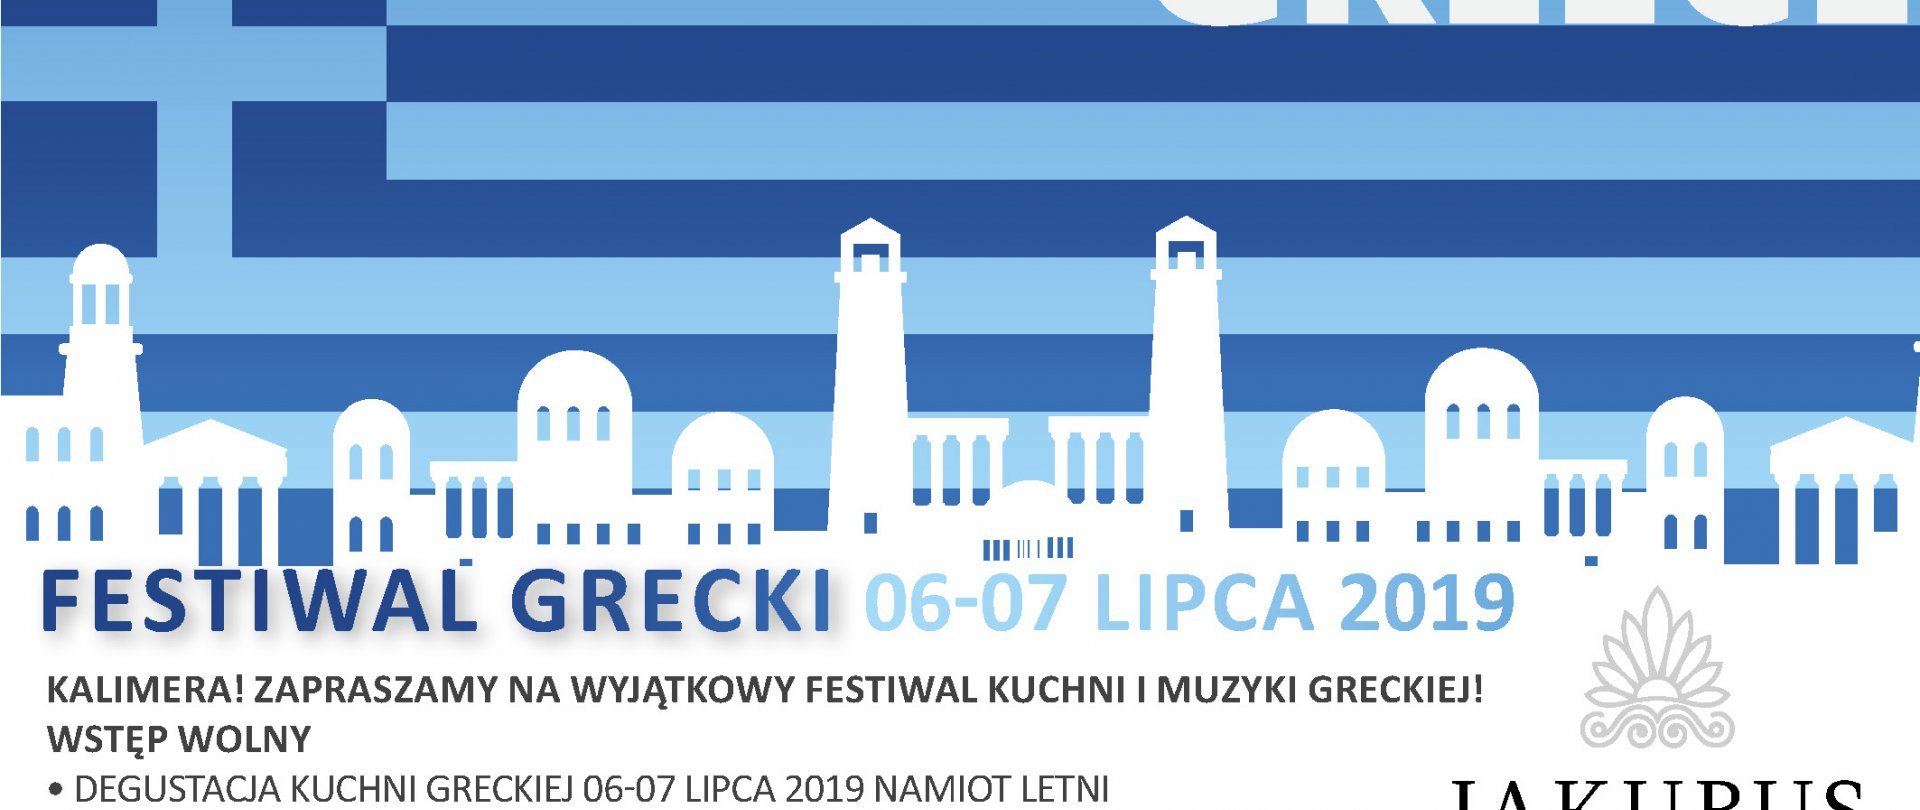 Festiwal Grecki 6-7 lipca 2019